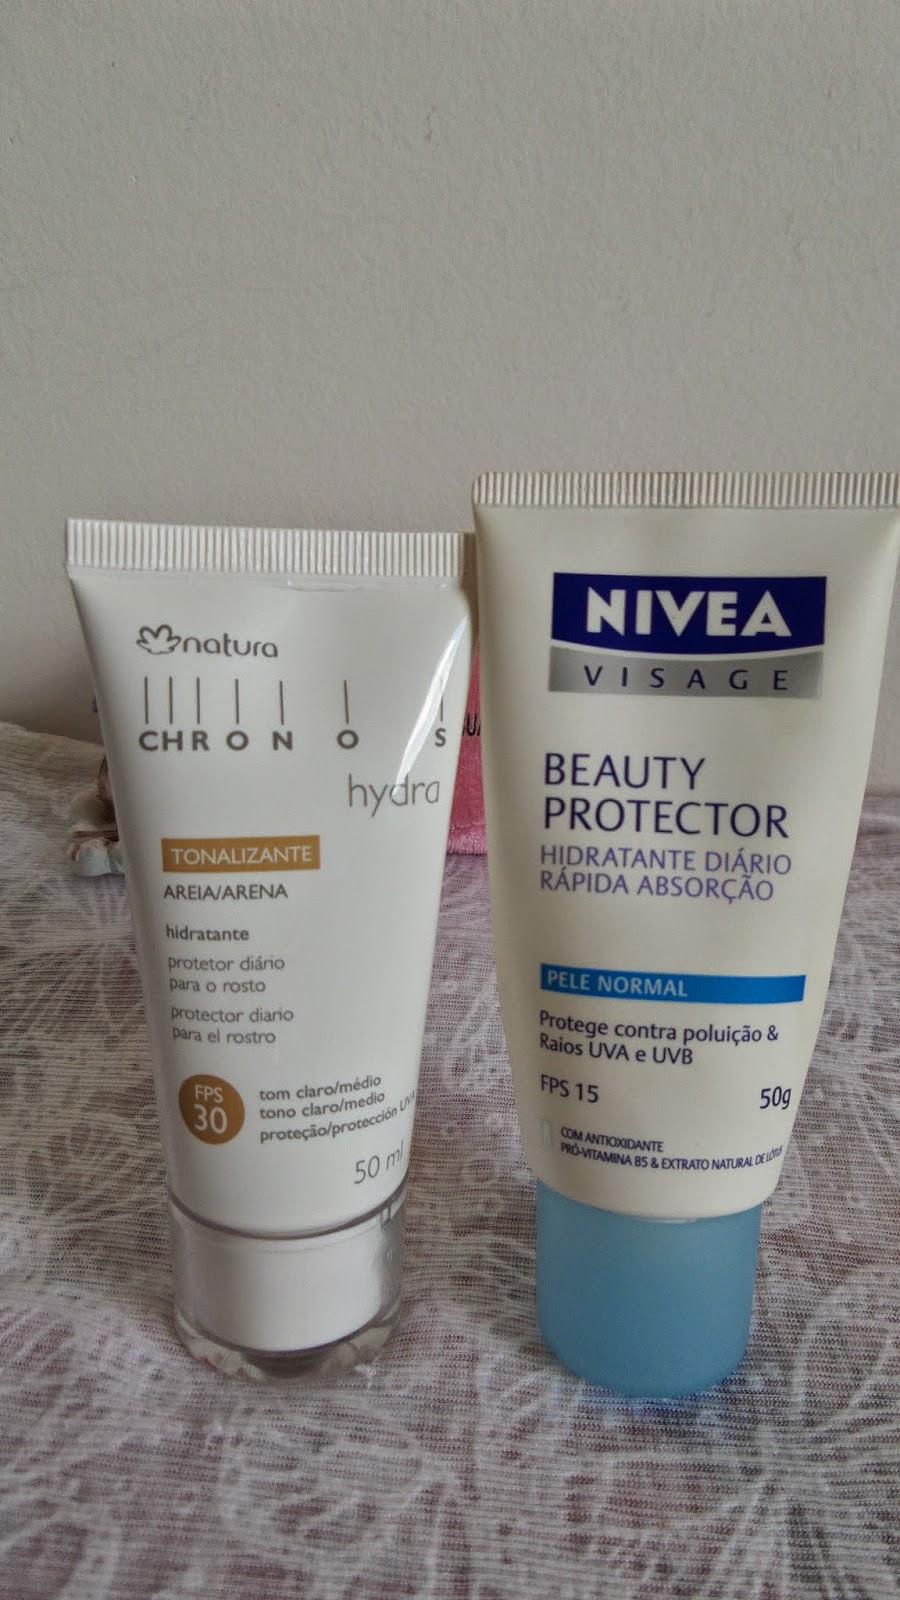 Hidratante Hydra Natura e Beauty Protector  Nivea